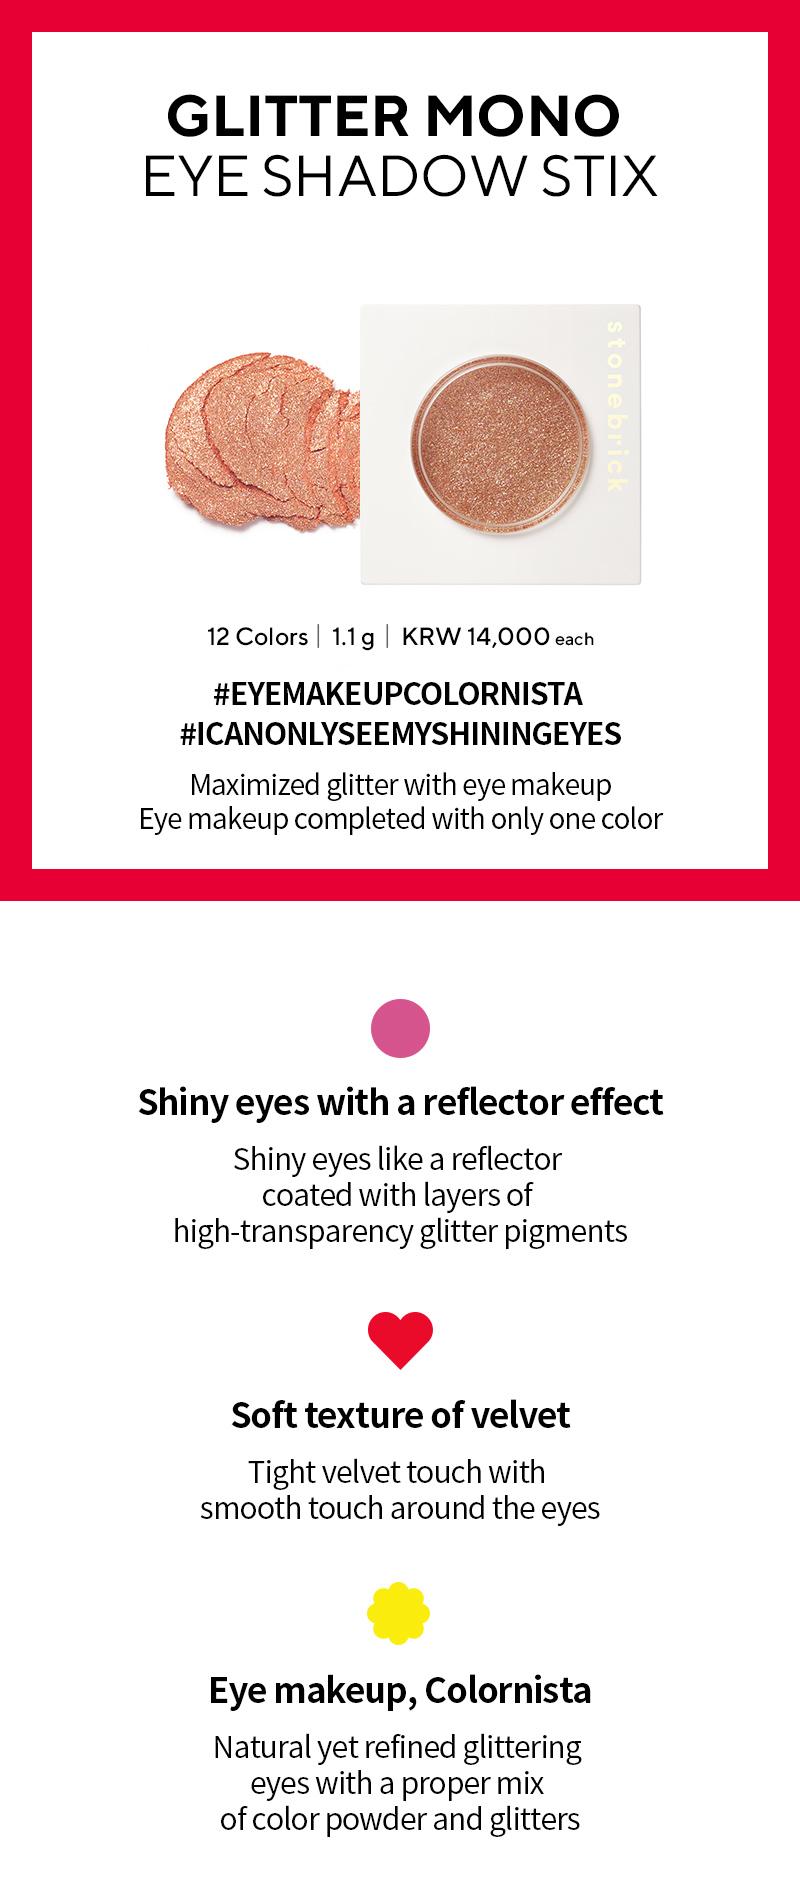 stonebrick-Glitter-Mono-Eye-Shadow-Sticks-10-Colors-1-1g-Product-Description-01